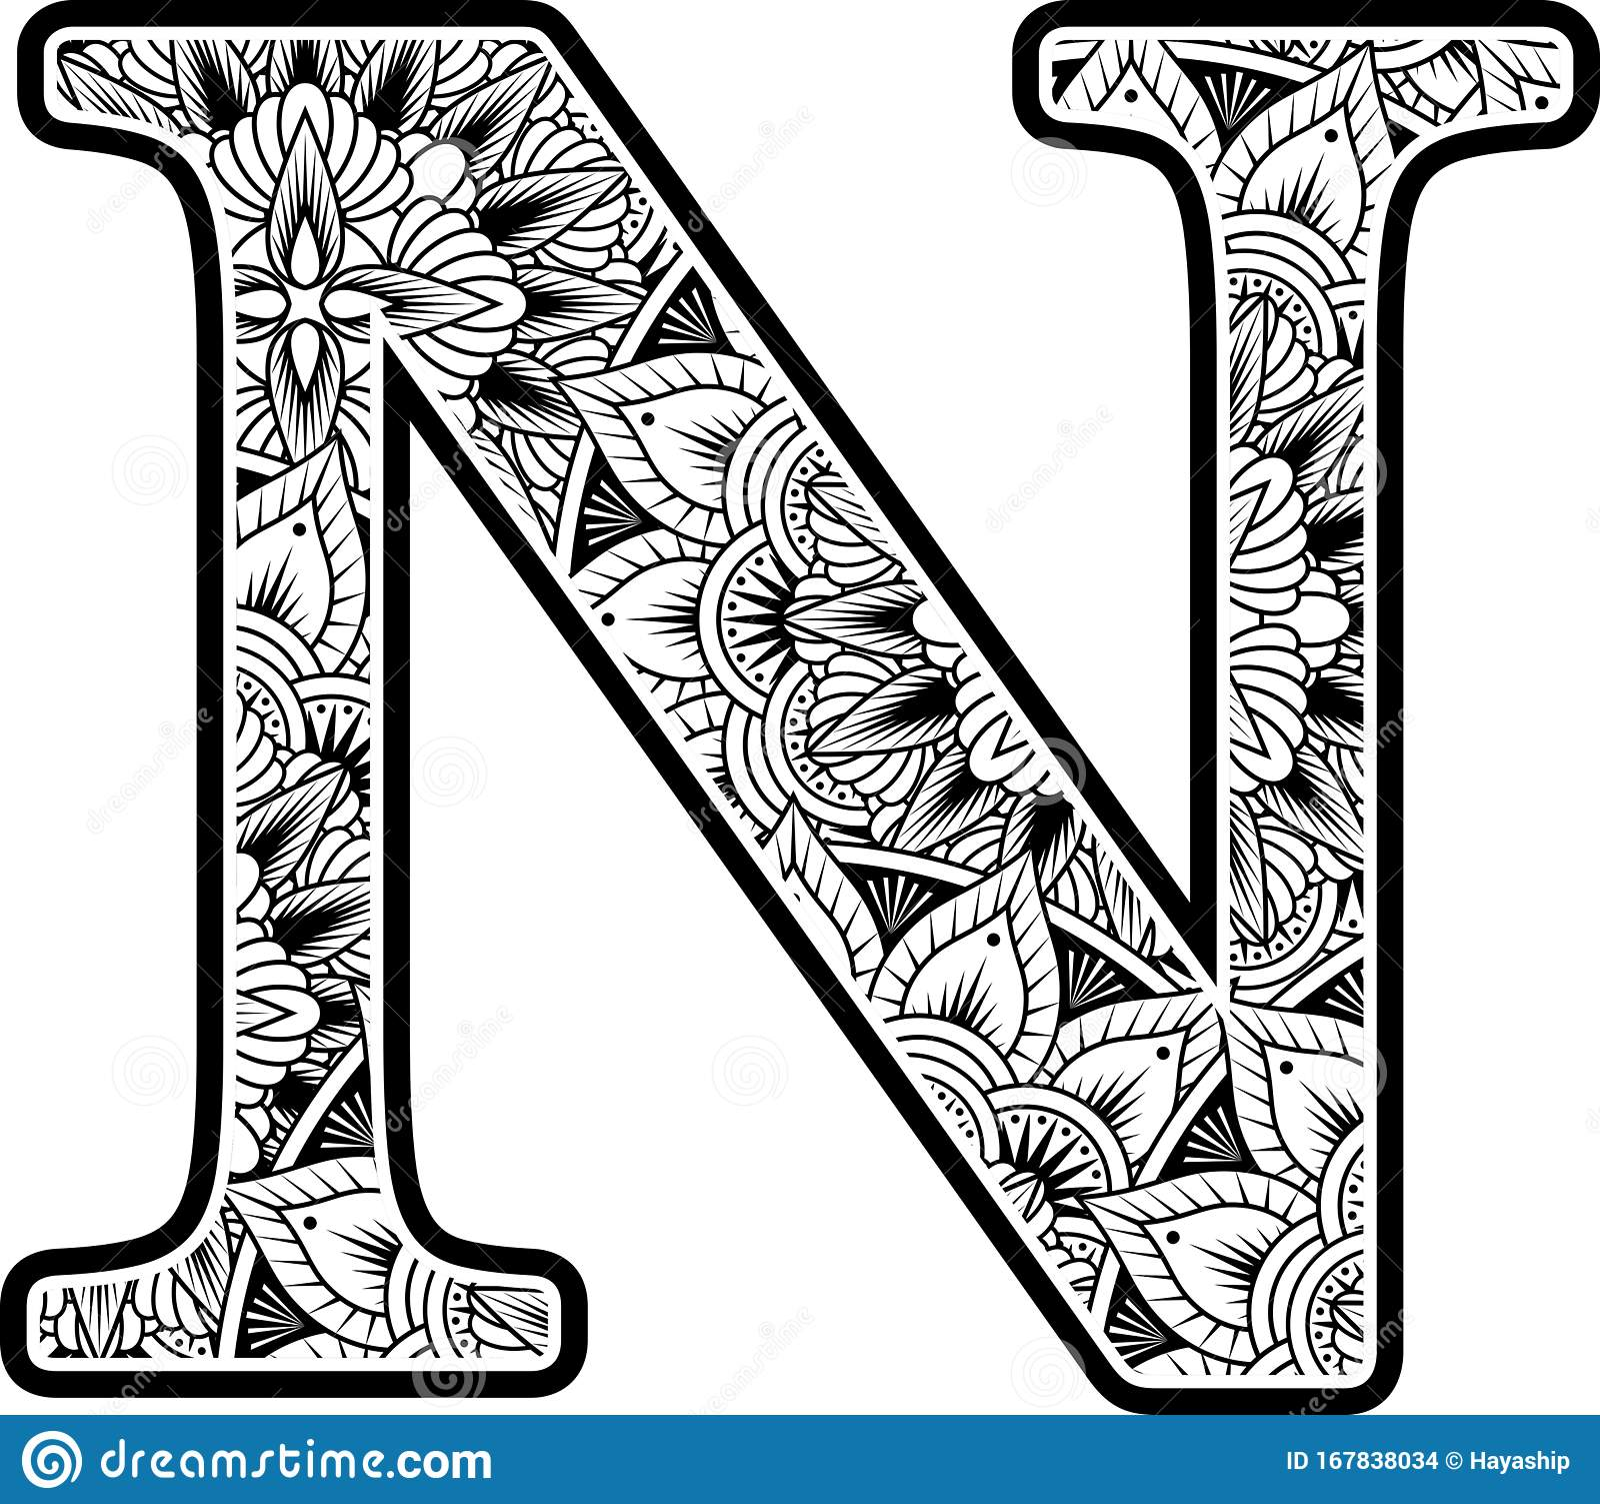 mandala inspiration abstract flowers capital letter n